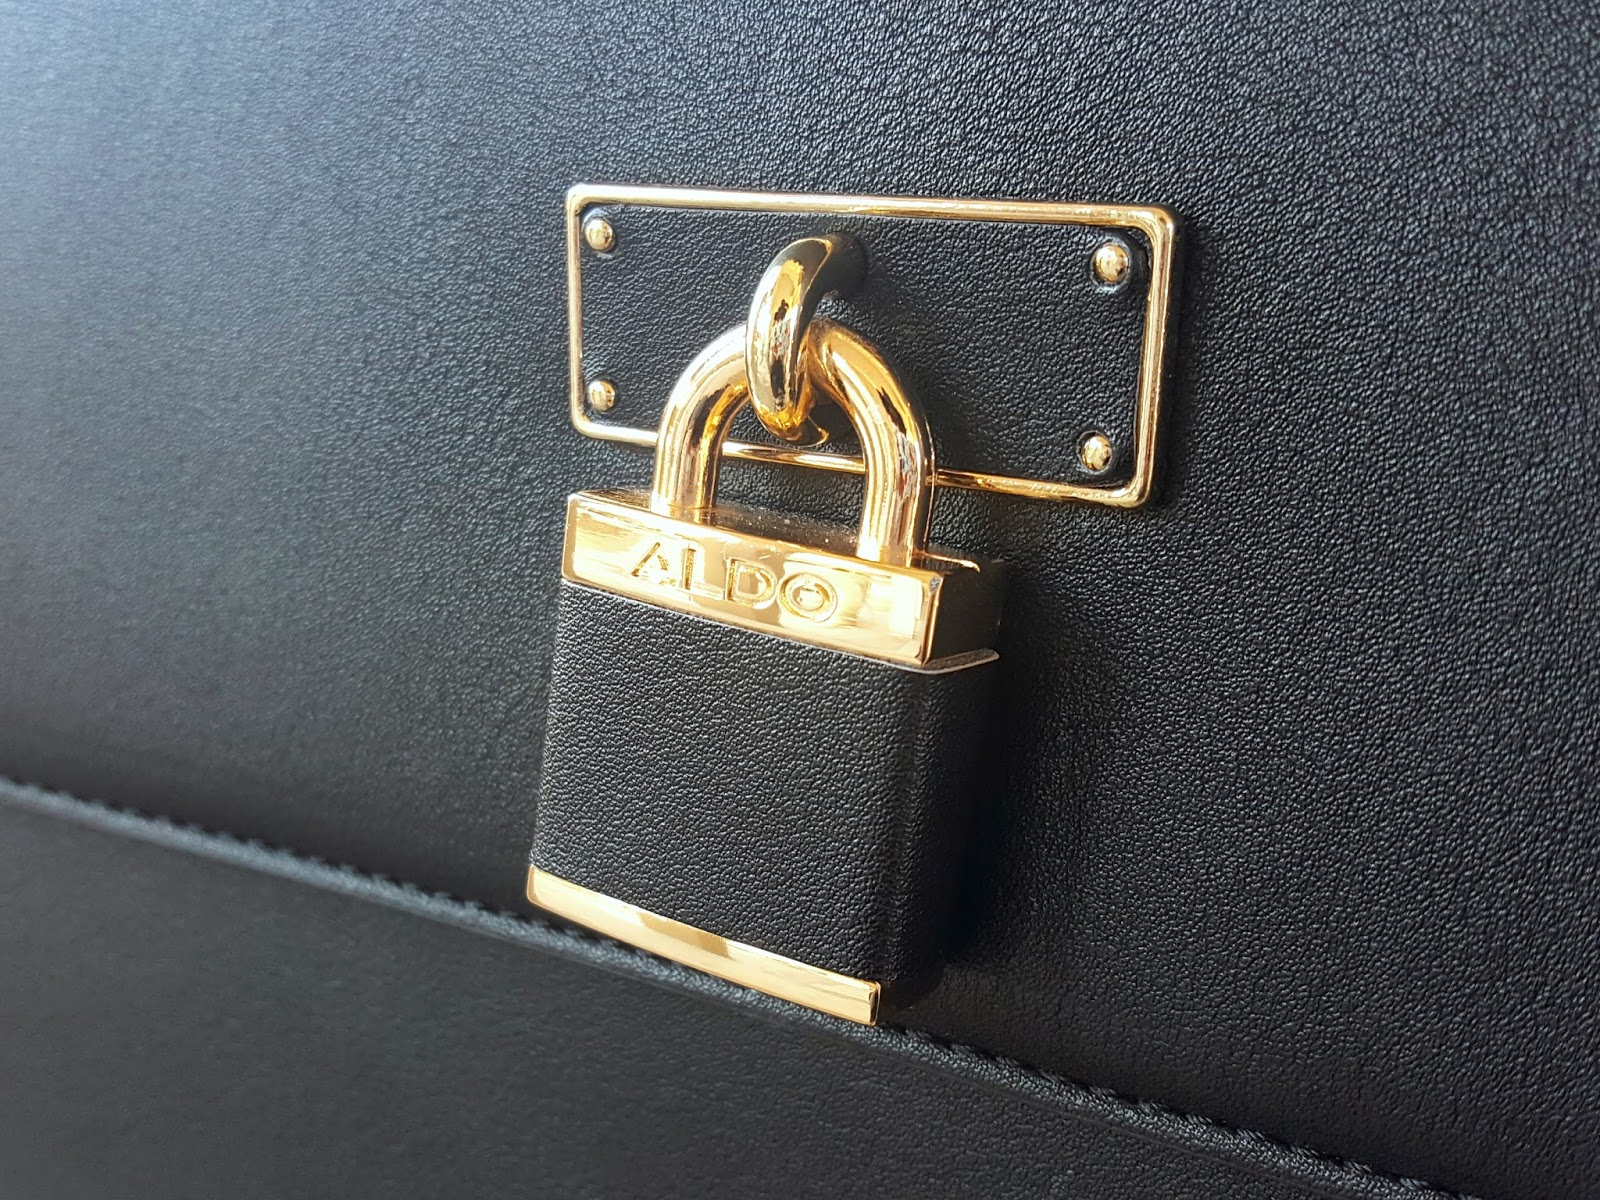 outfit-of-the-day, ootd, aldo-haronden-bag, aldo-haronden-bag-closeup, gold-lock-hardware